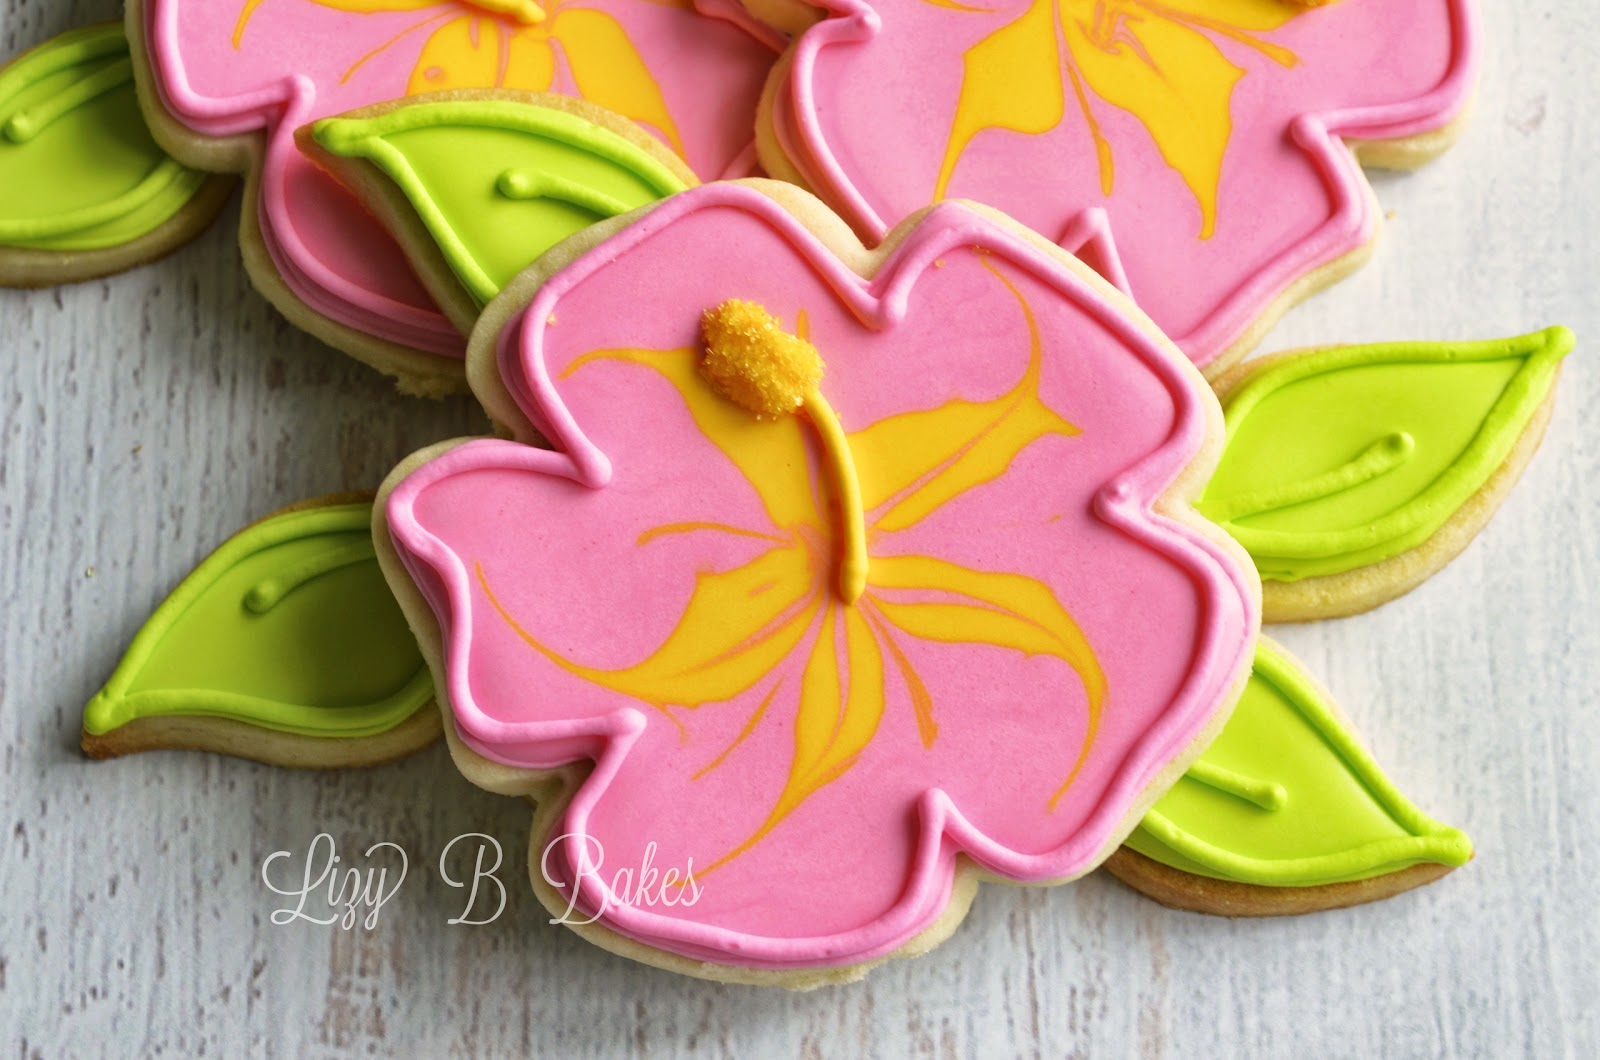 Lizy B Tropical Flower Cookies